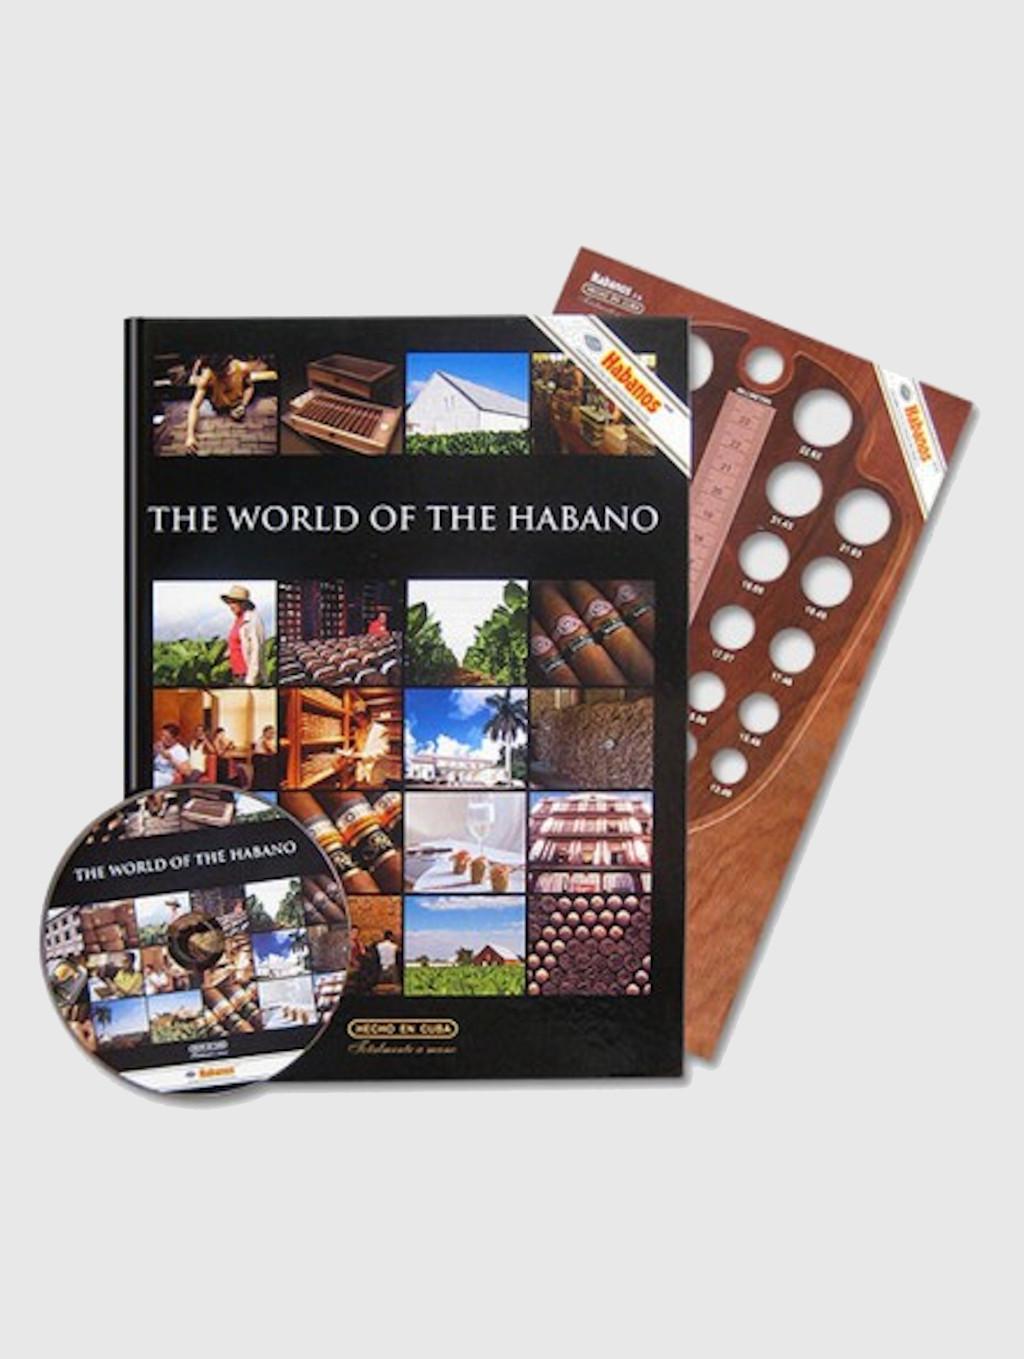 Livro El Mundo Del Habano - Idioma: Espanhol